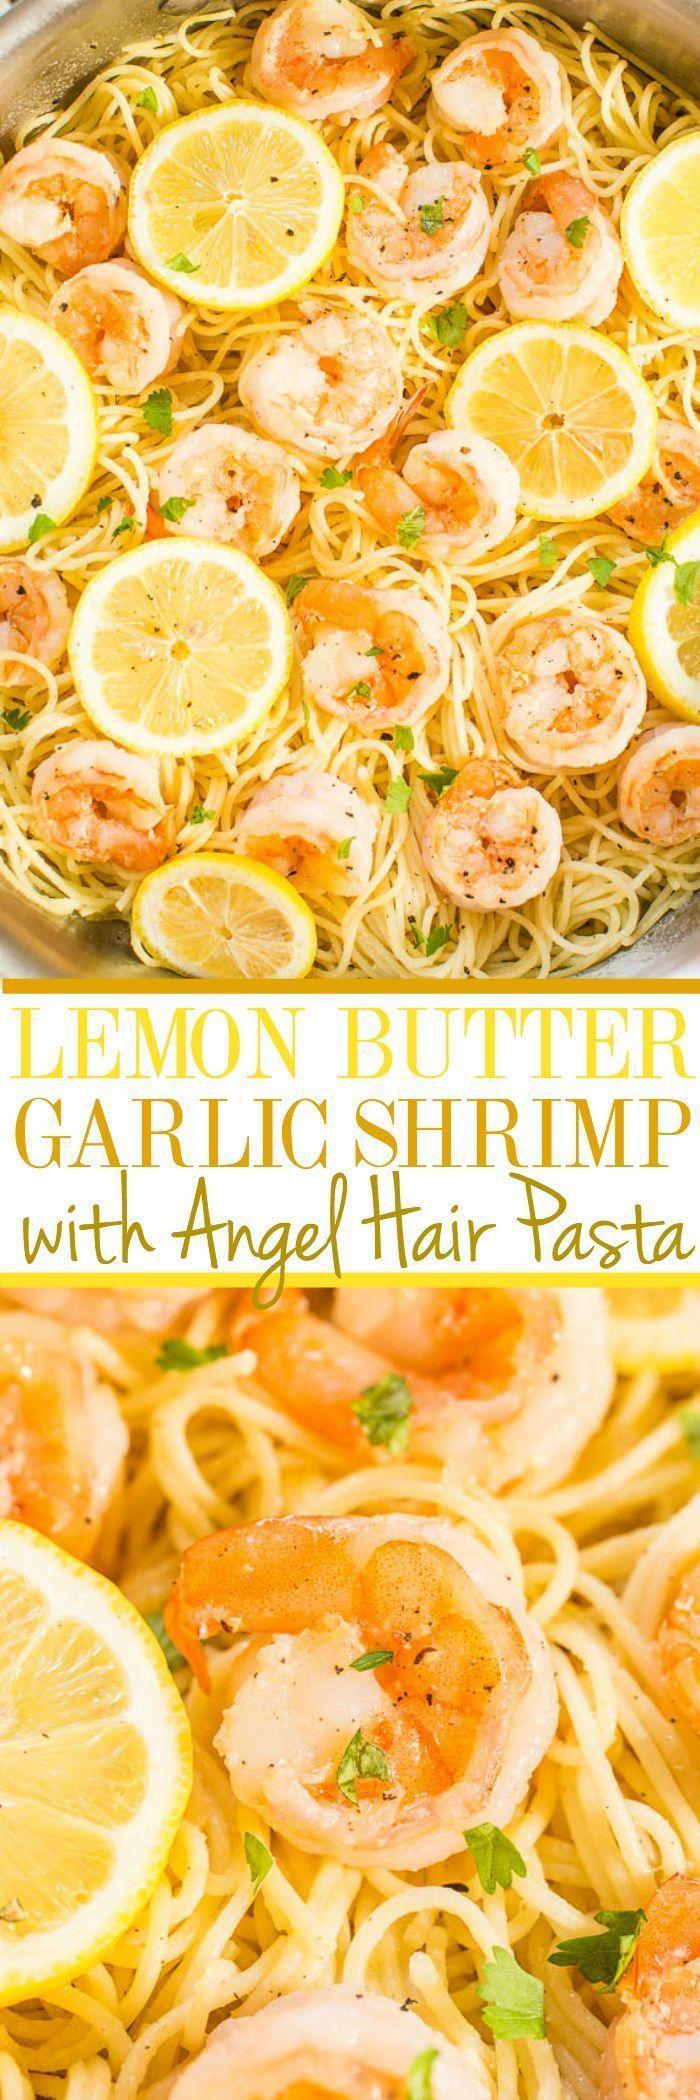 Lemon Butter Garlic Shrimp with Angel Hair Pasta - Easy and ready in 15 minutes!... - Kochrezepte -